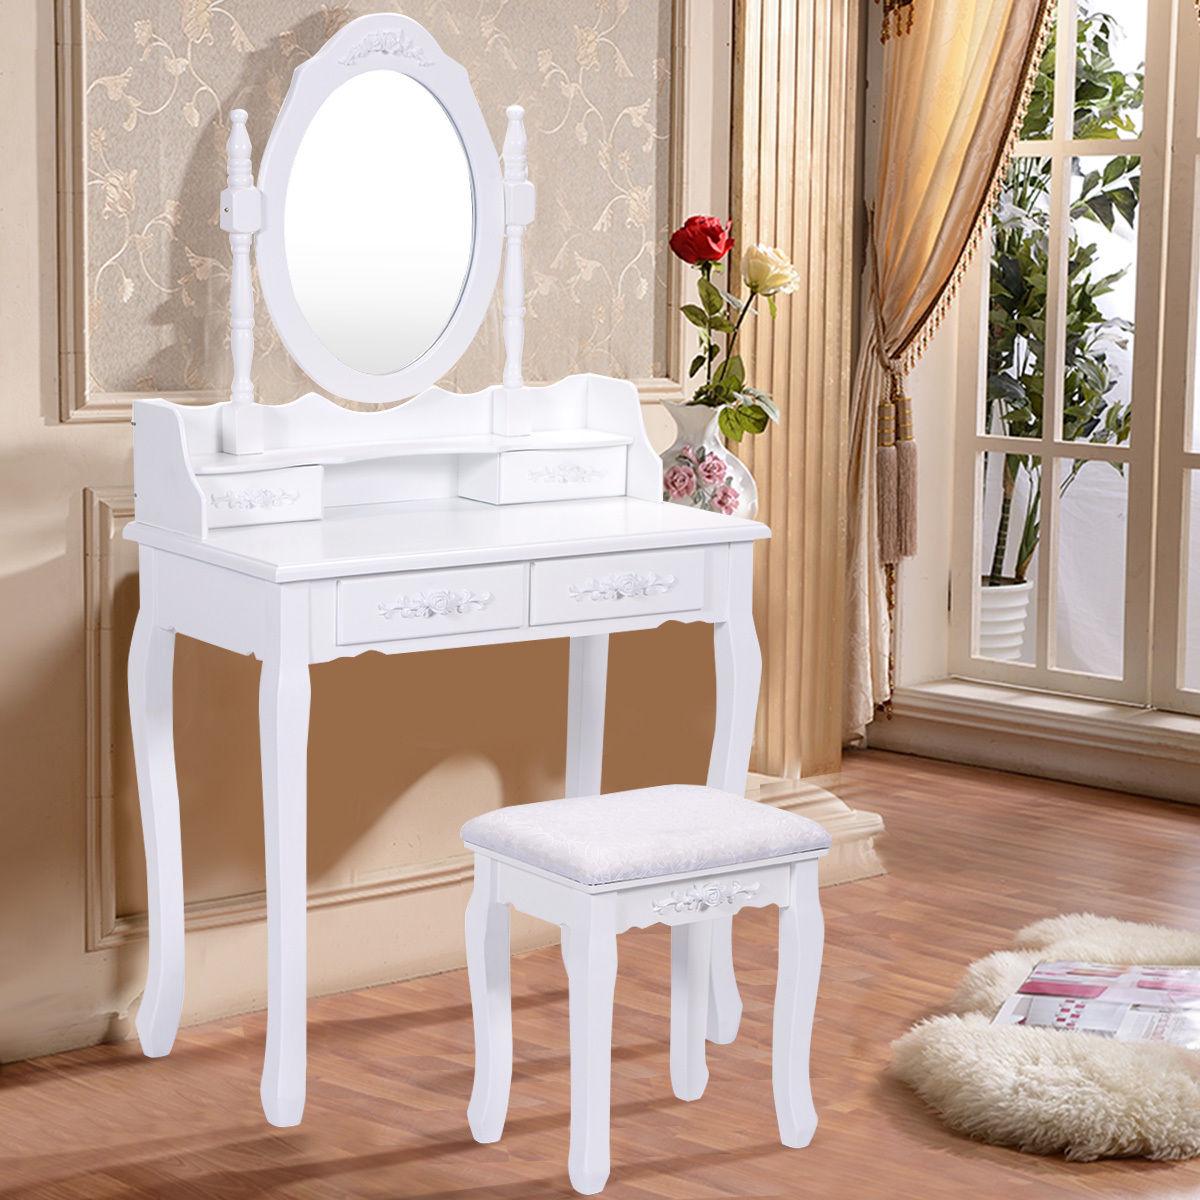 Costway White Vanity Wood Makeup Dressing Table Stool Set bathroom with Mirror + 4Drawers by Costway